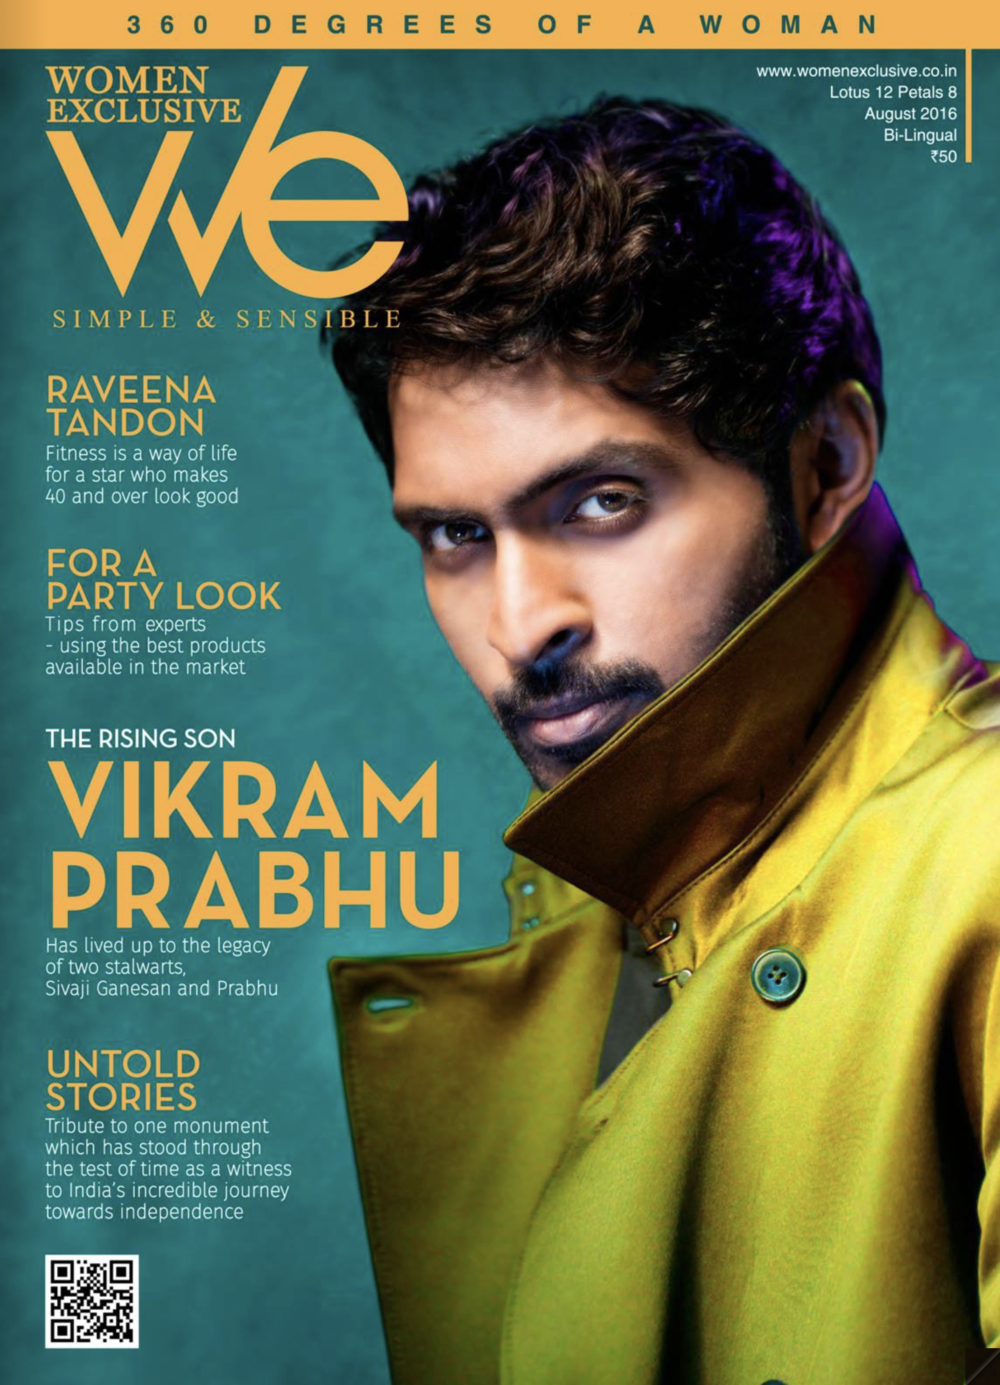 VIKRAM PRABHU | Actor / Producer